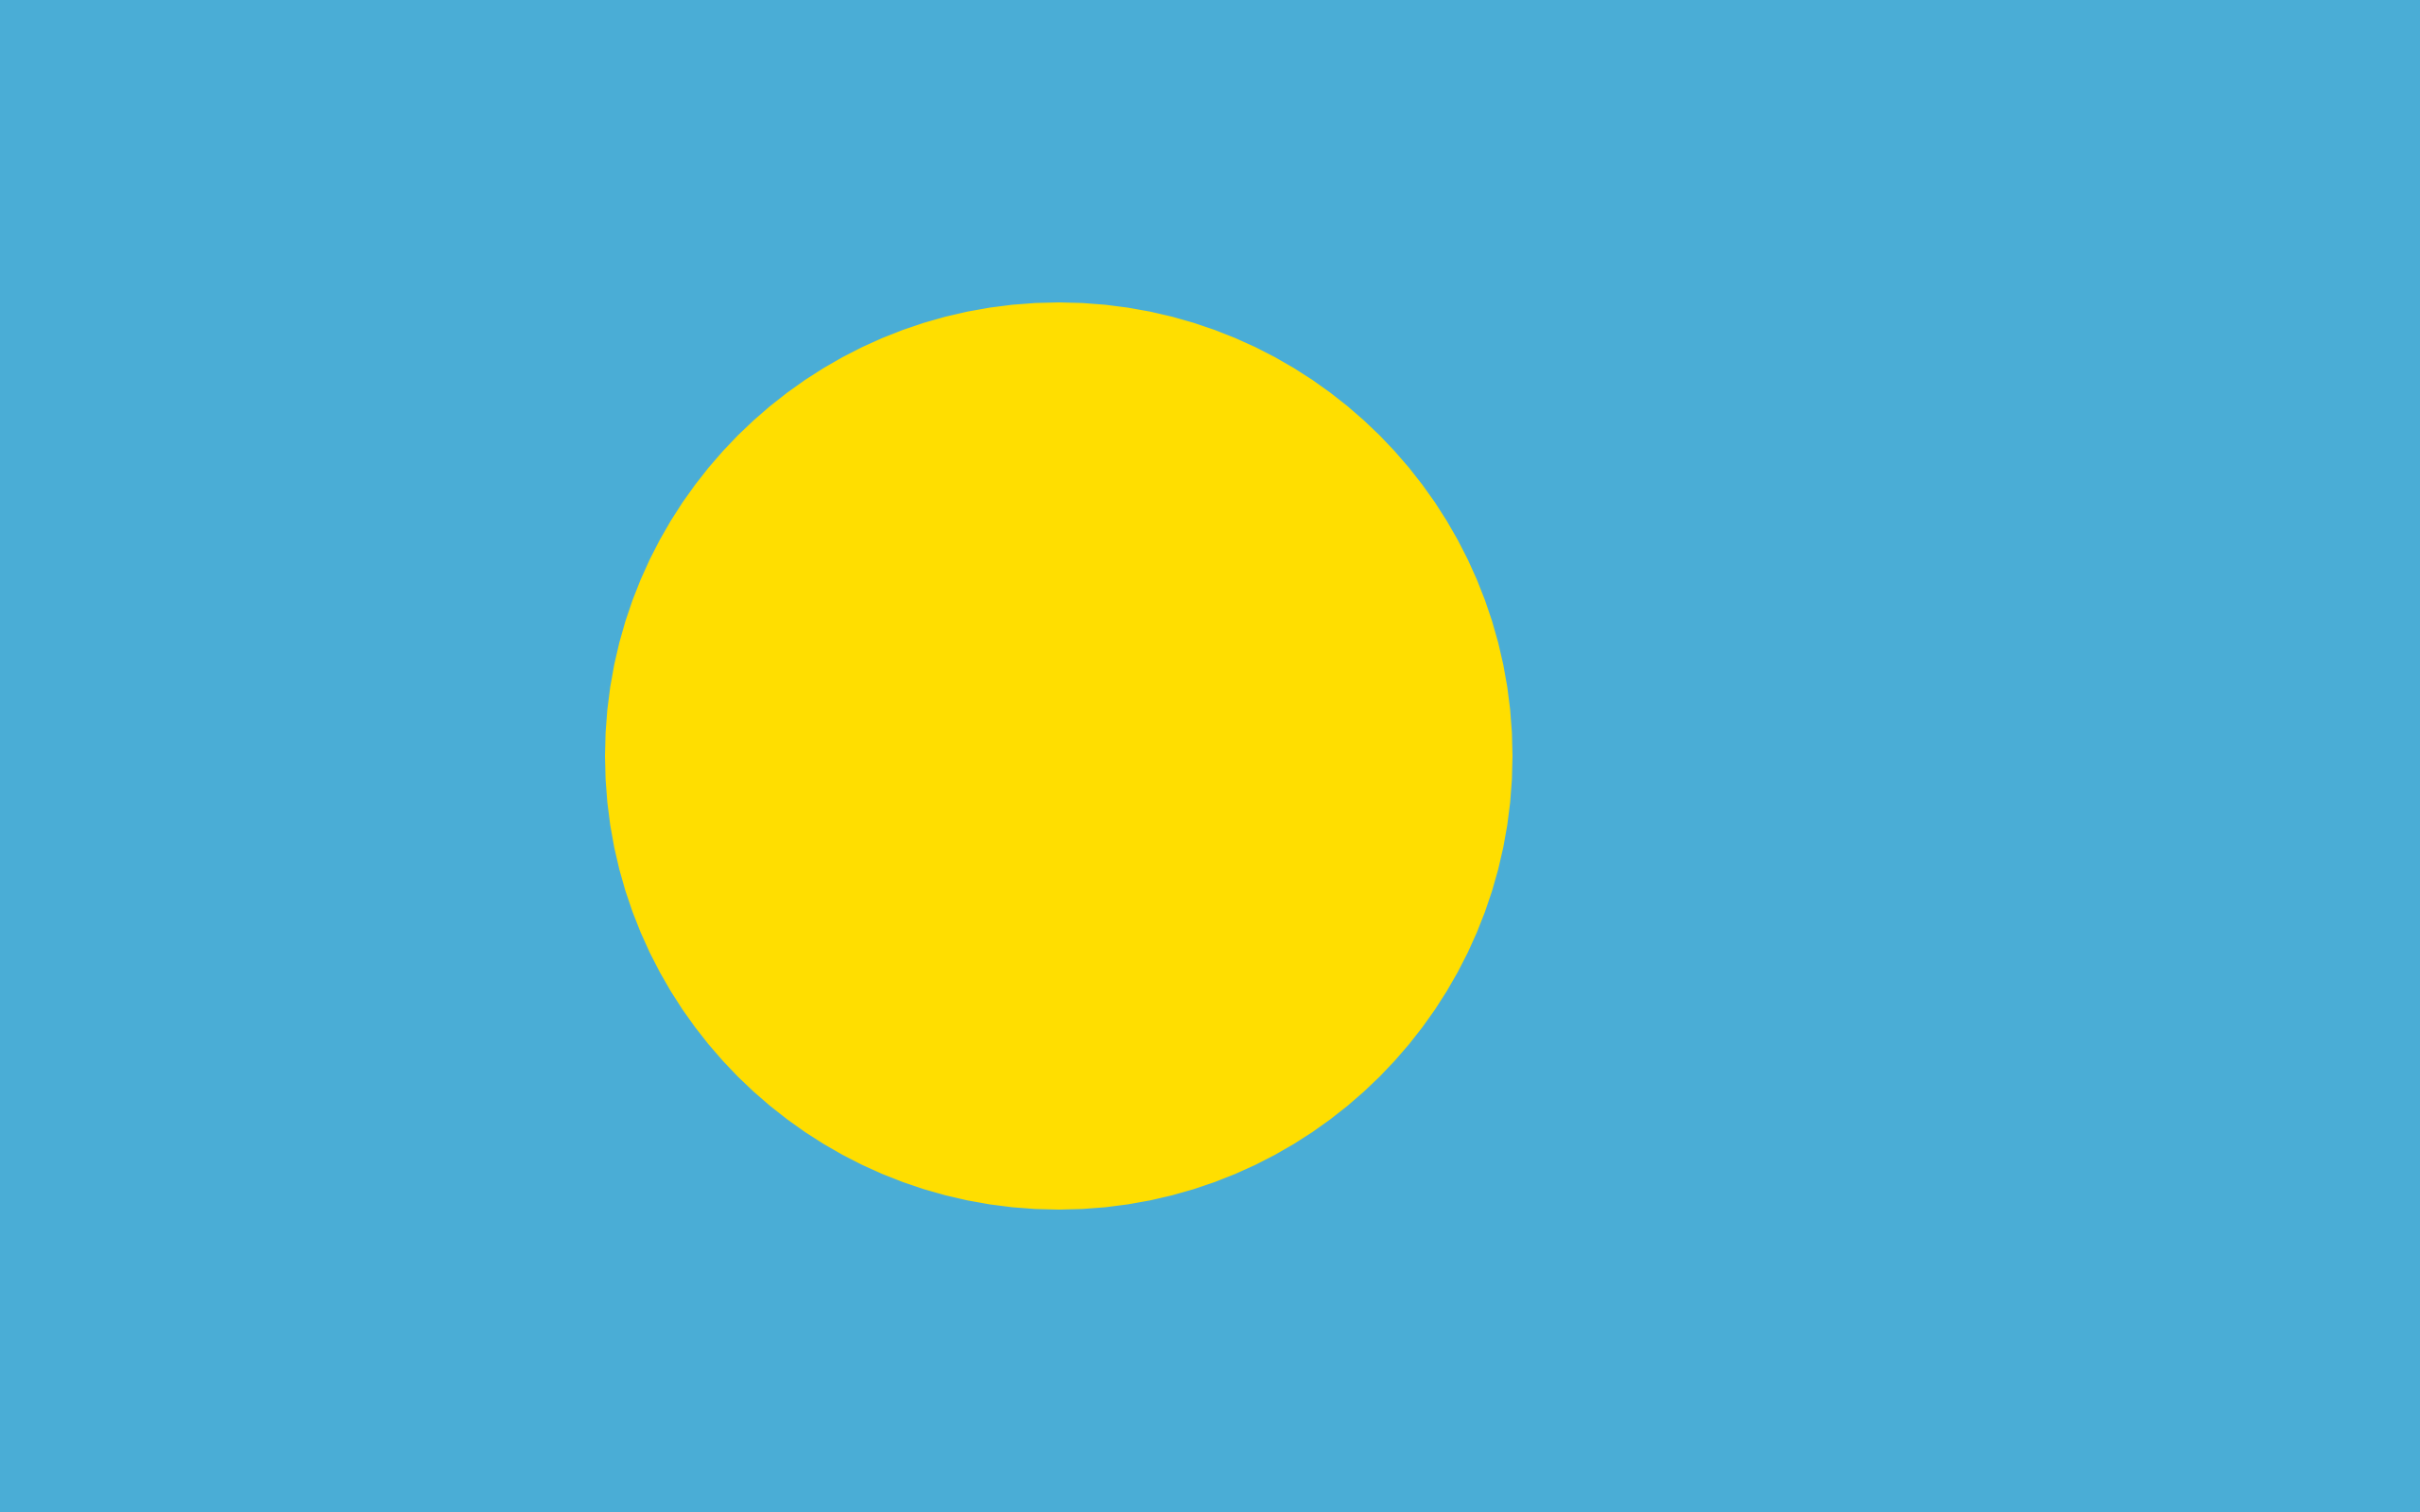 palaos, देश, emblema, लोग�प्रतीकbolo - HD वॉलपेपर - प्रोफेसर-falken.com